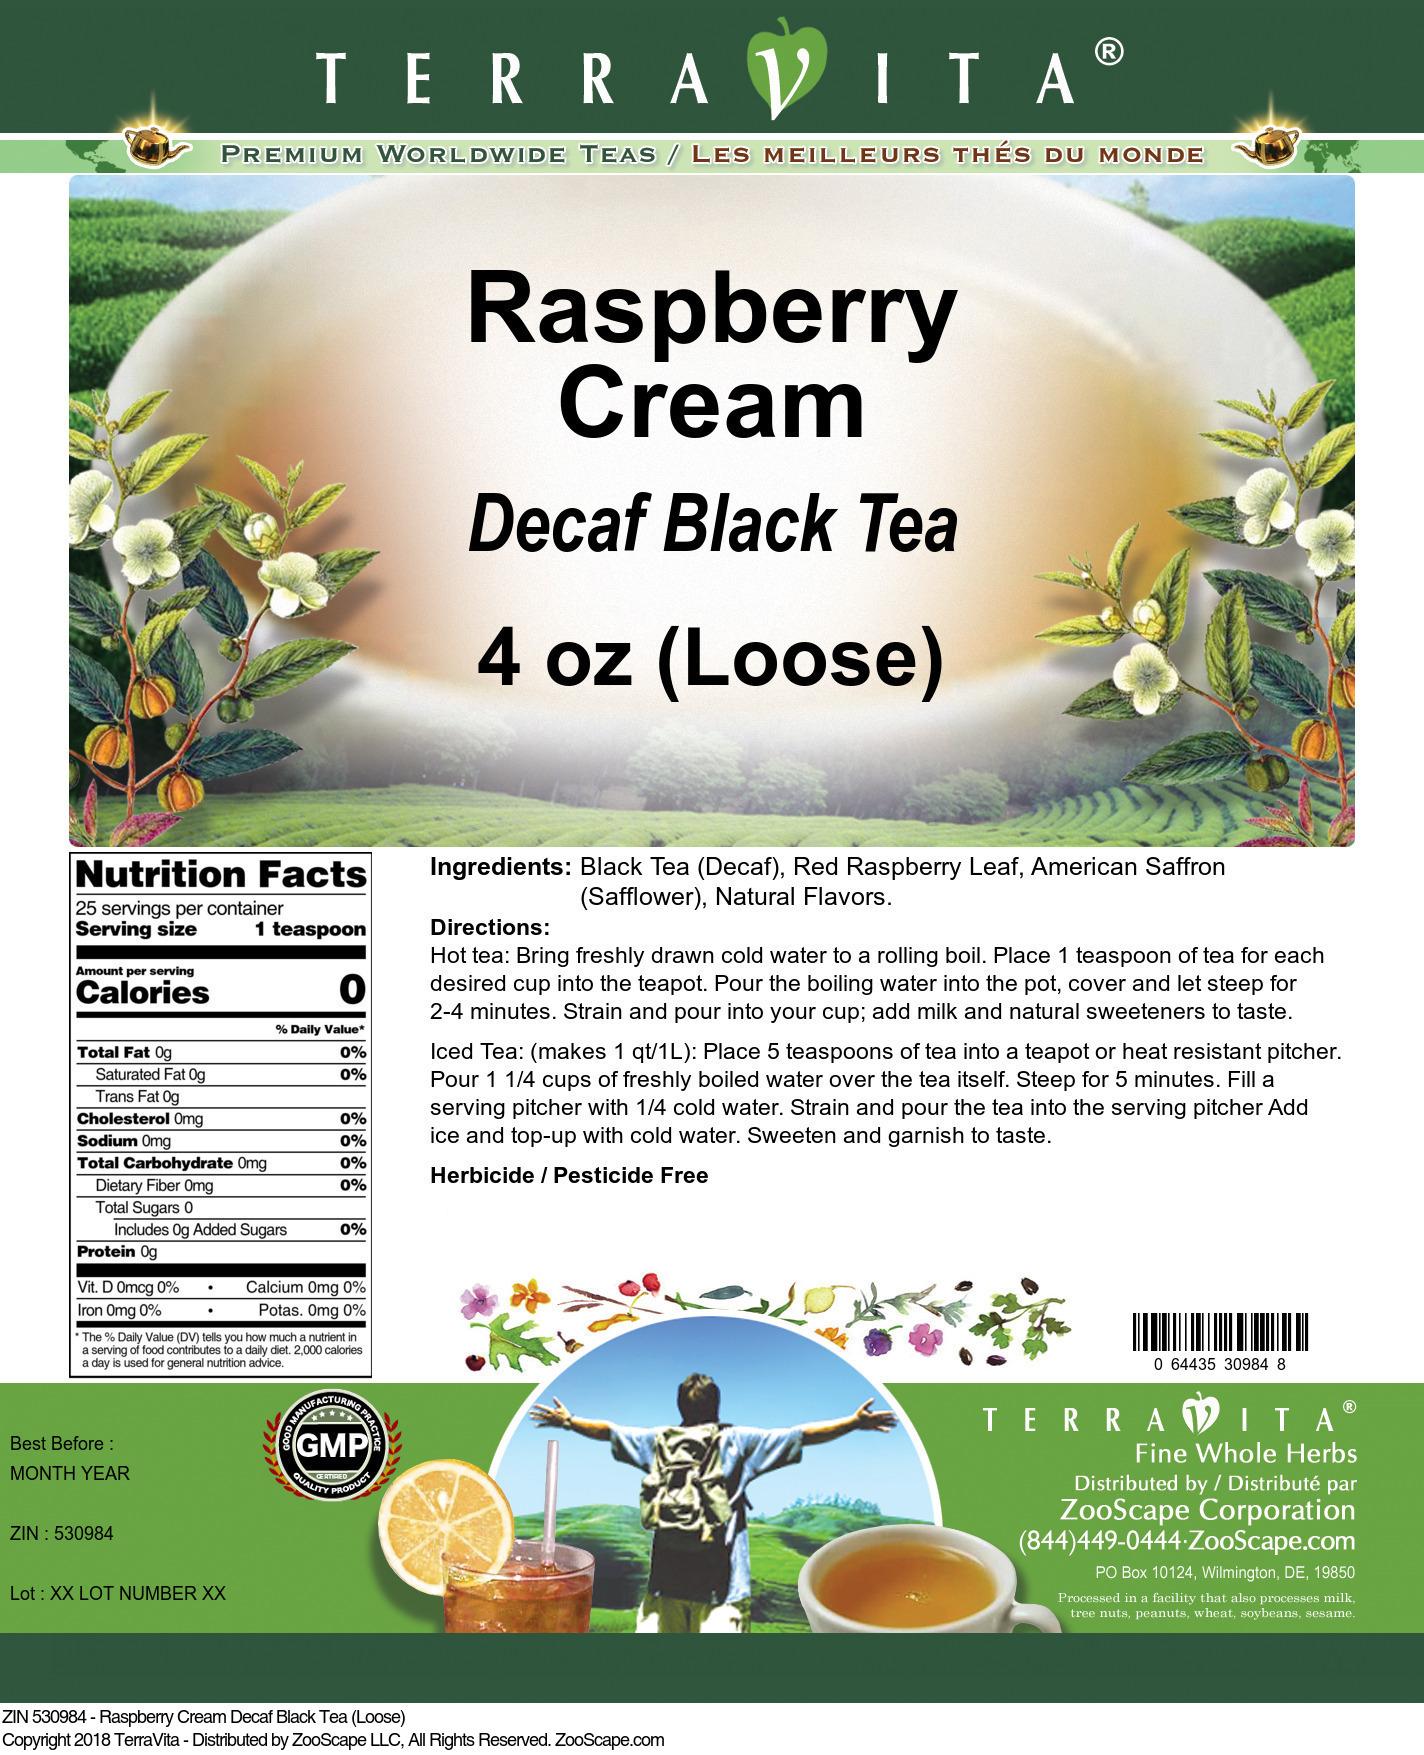 Raspberry Cream Decaf Black Tea (Loose)